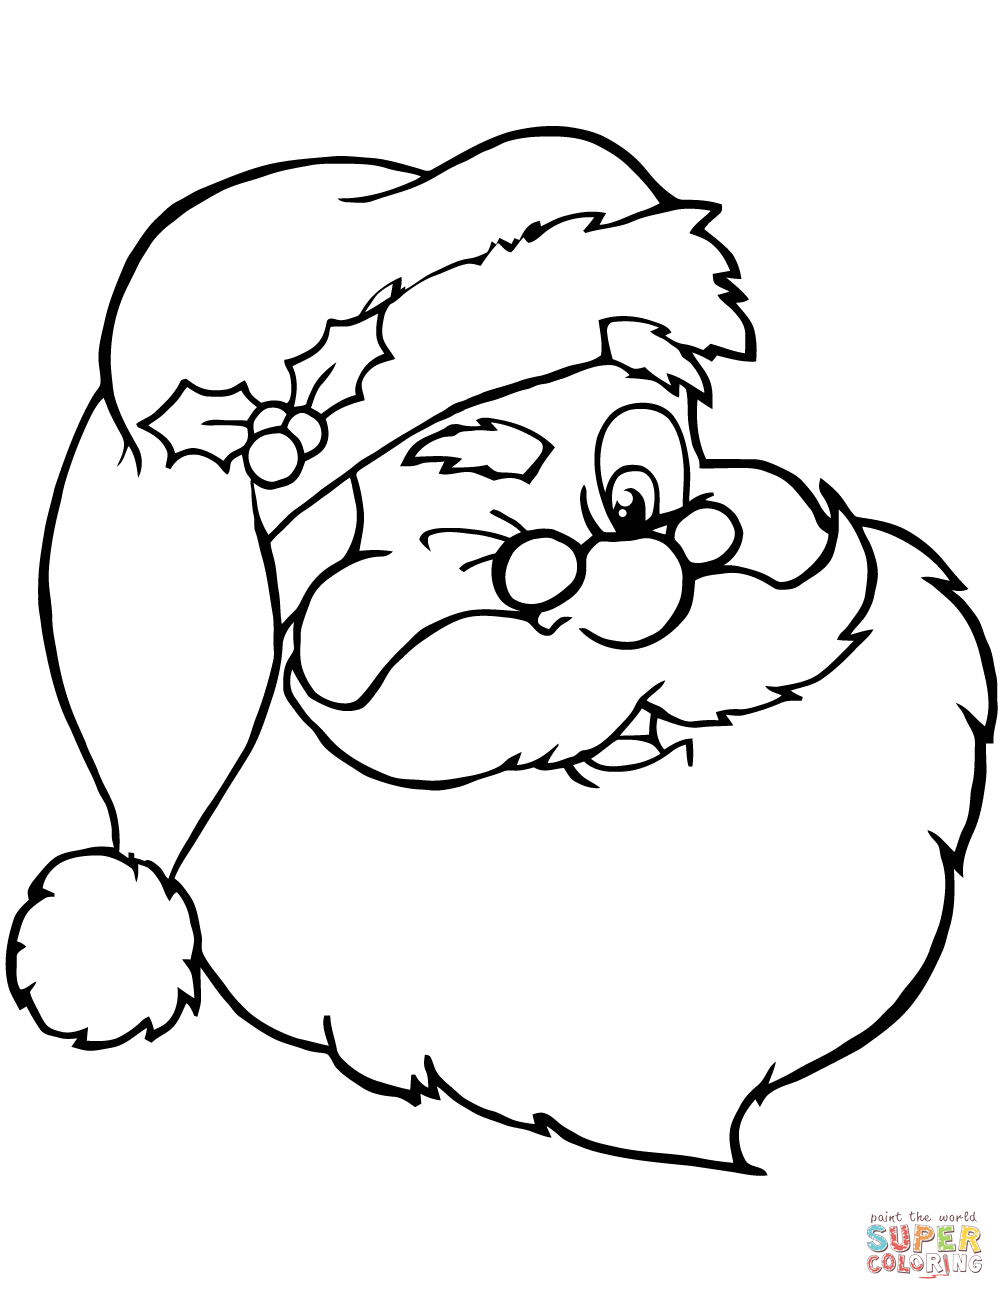 Feliz Navidad Christmas Tree Coloring Pages